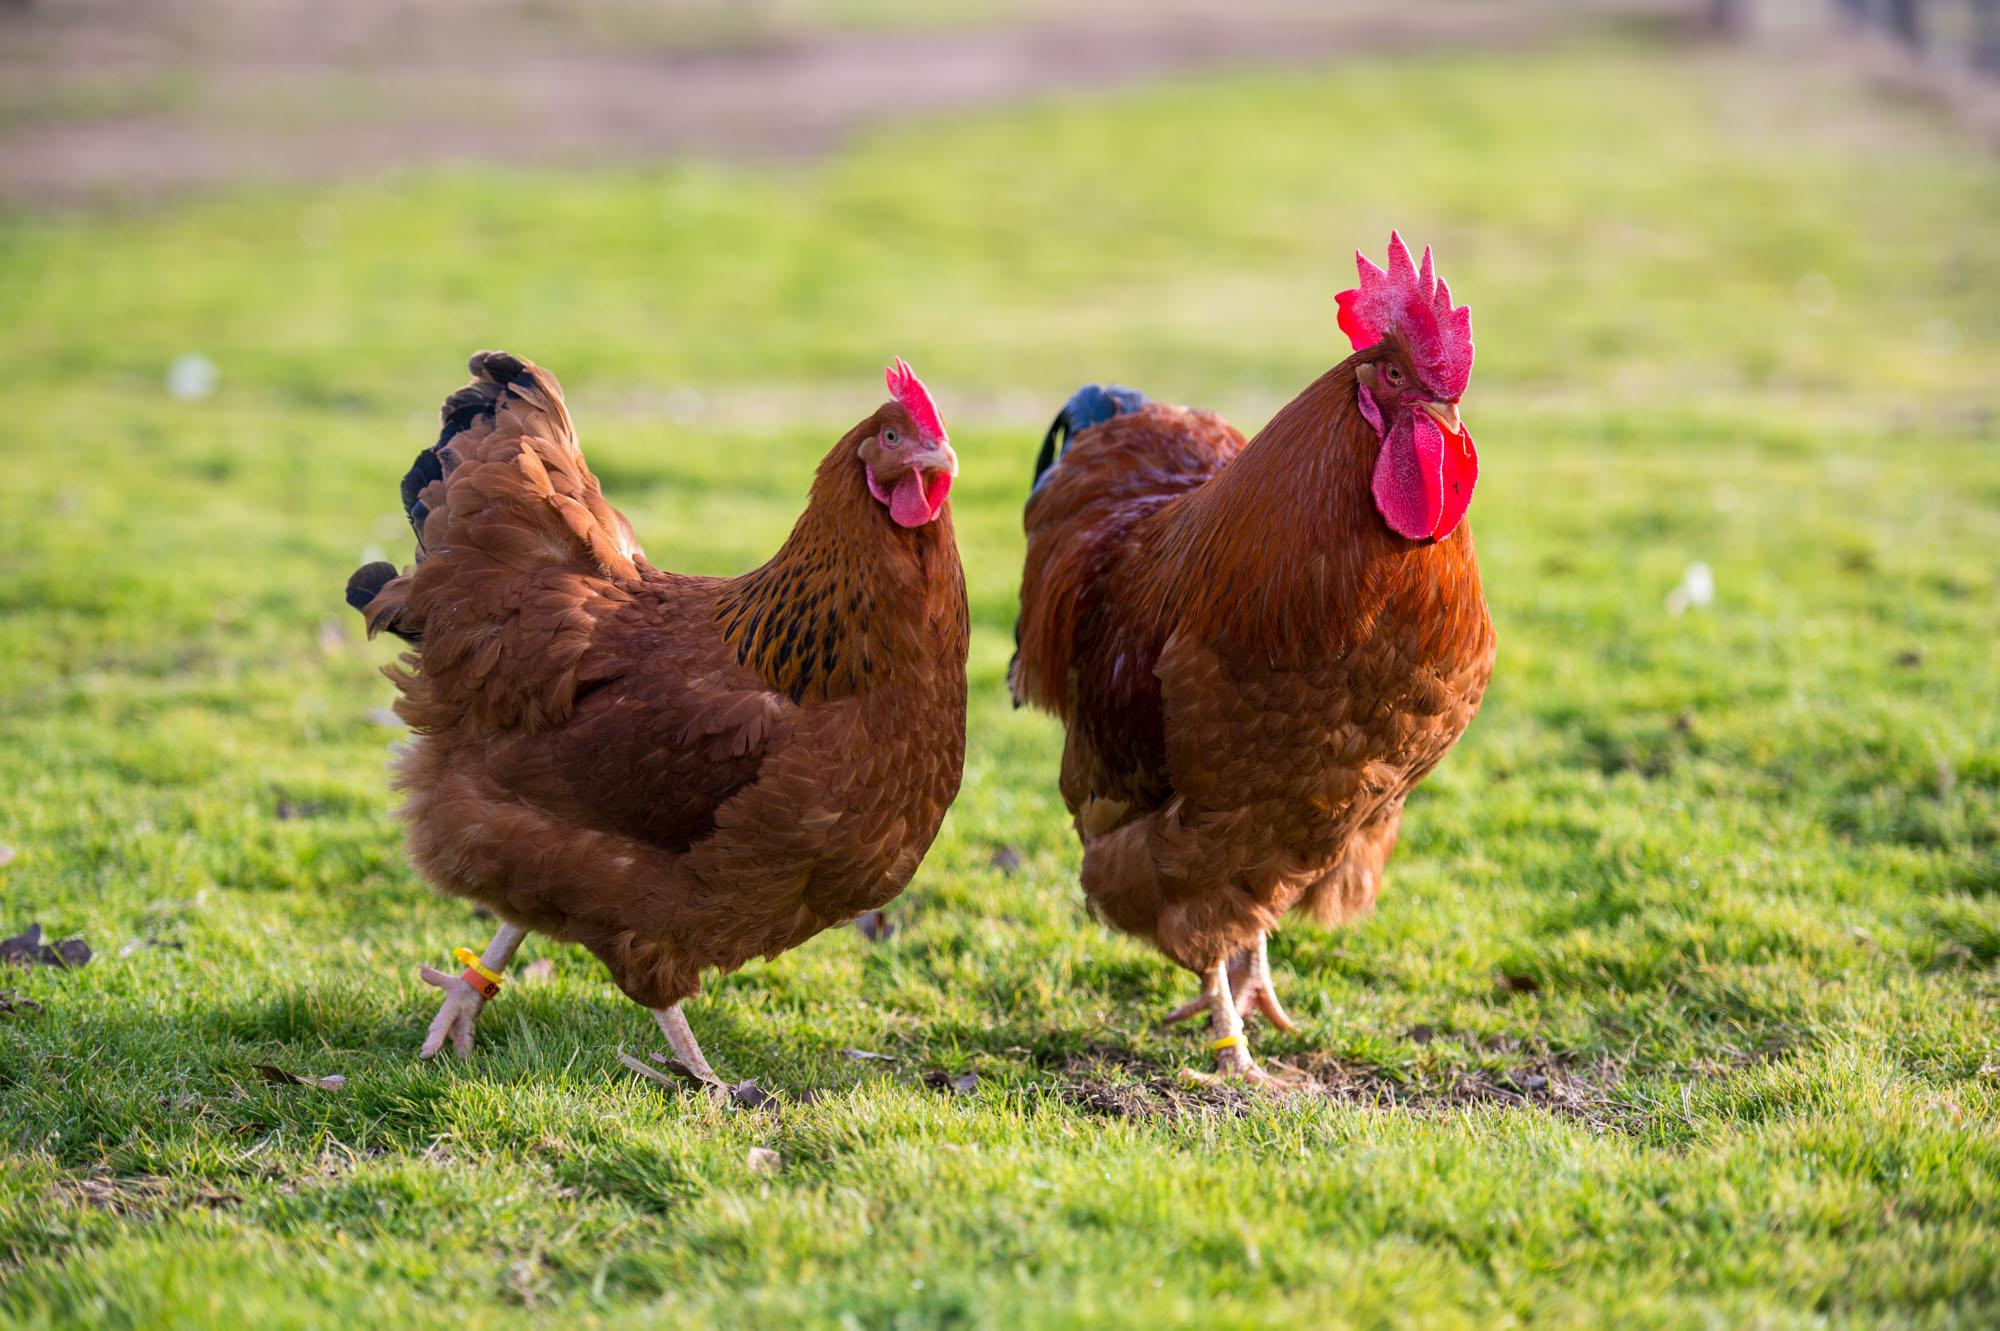 Нью-Гемпшир порода кур